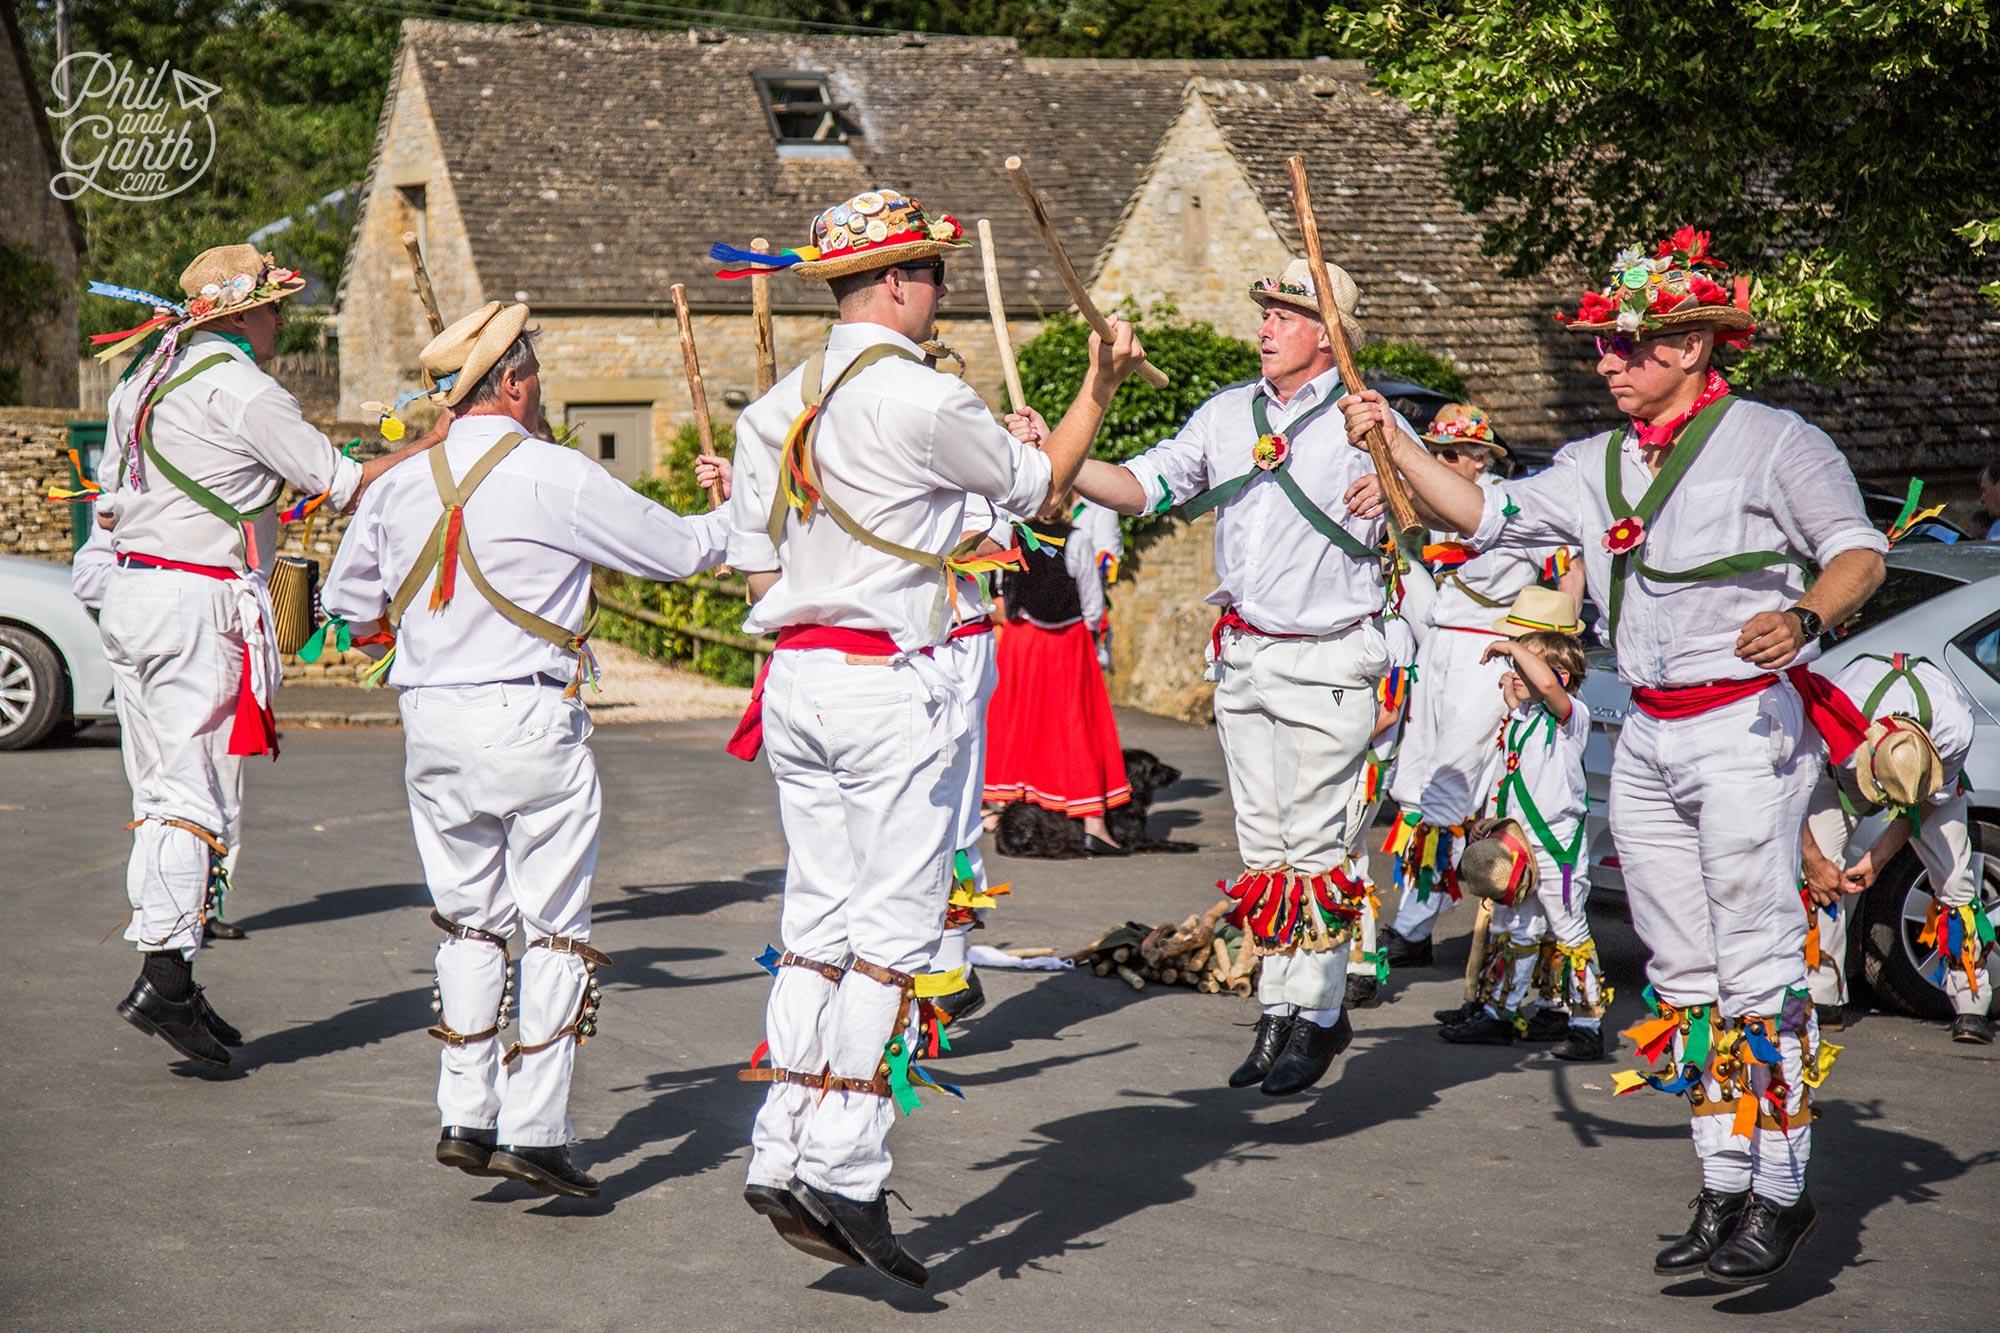 Traditional Morris dancers in Upper Slaughter